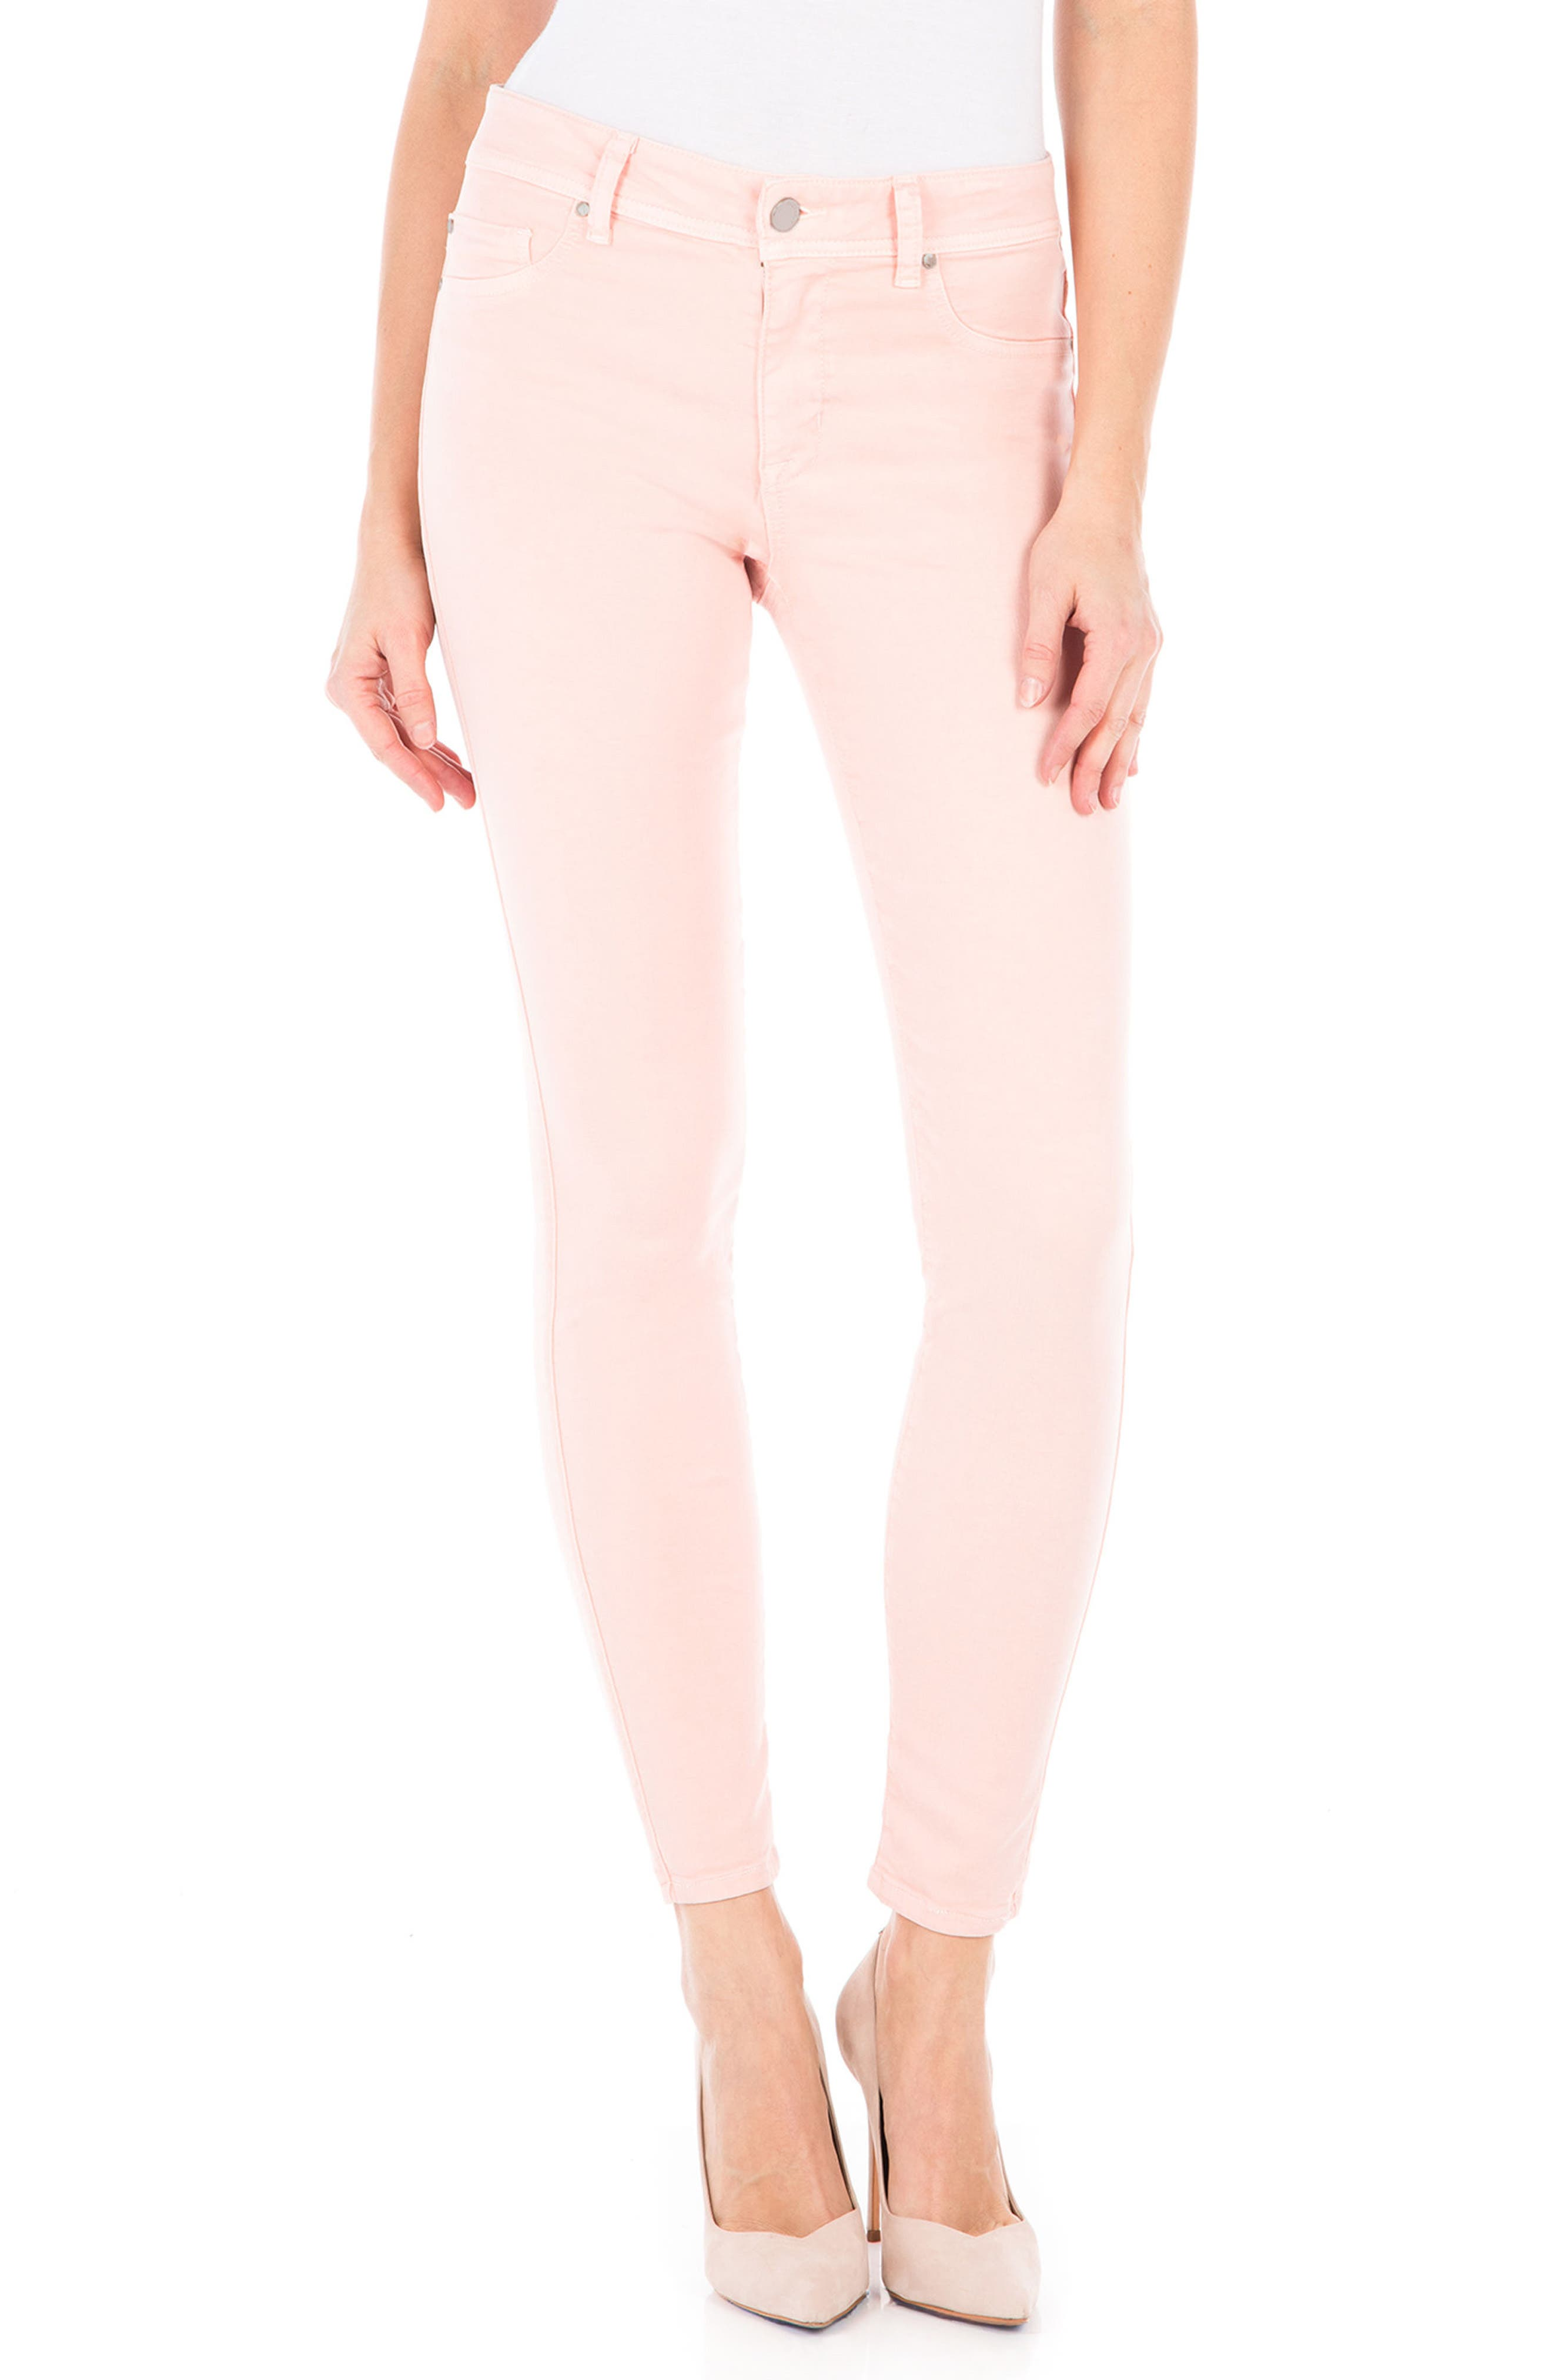 Main Image - Fidelity Denim Sola Skinny Jeans (Dusty Rose)